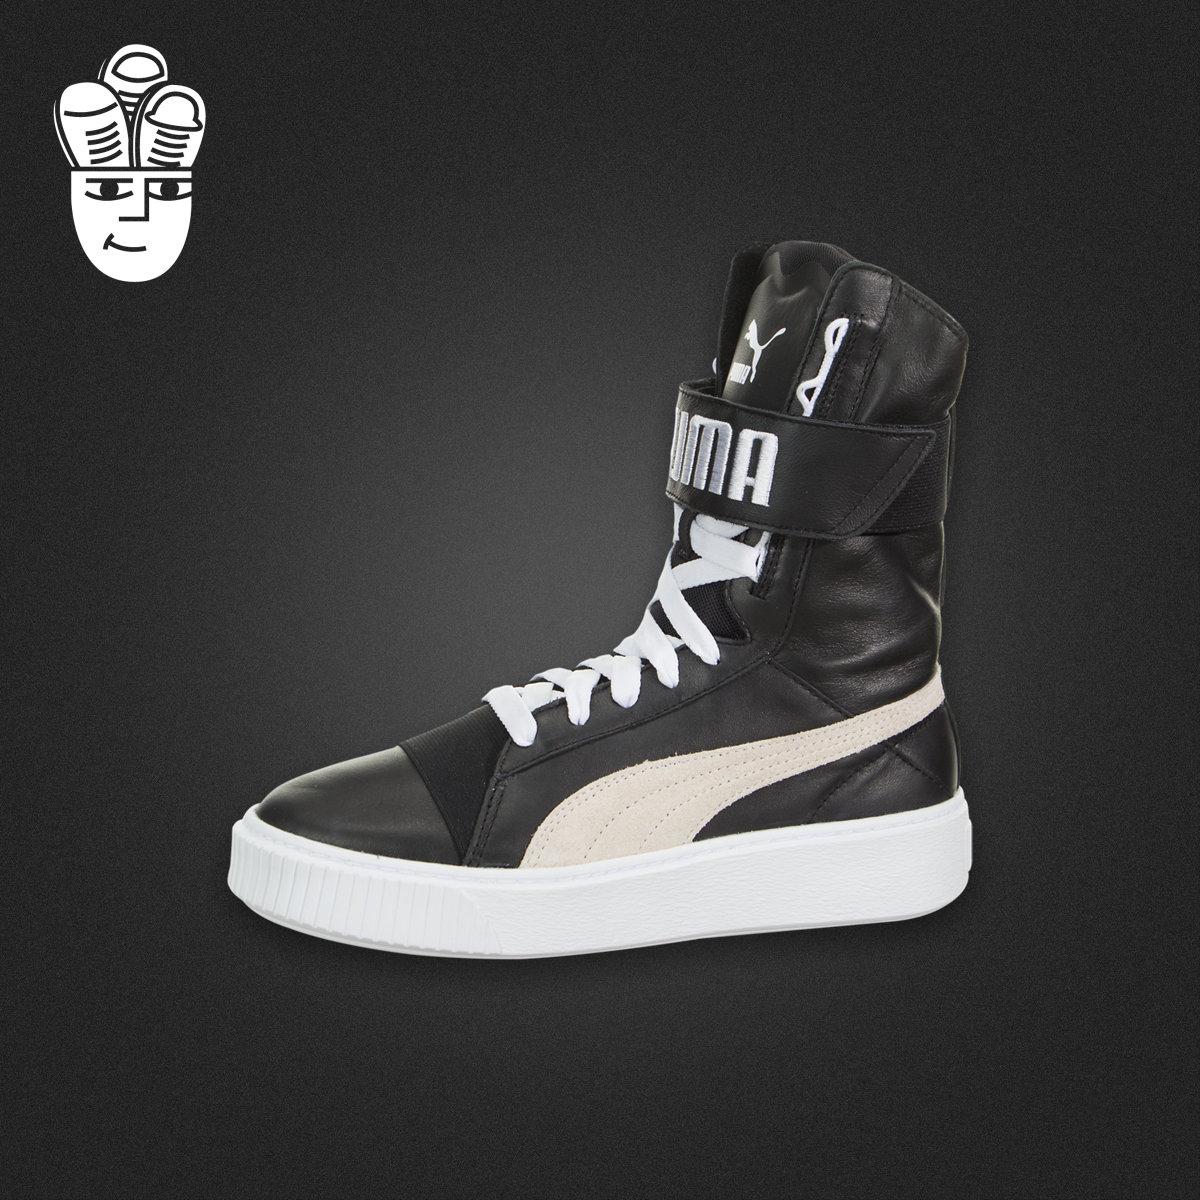 Puma Platform 彪马女鞋 黑白奥利奥高帮松糕板鞋 潮流休闲鞋